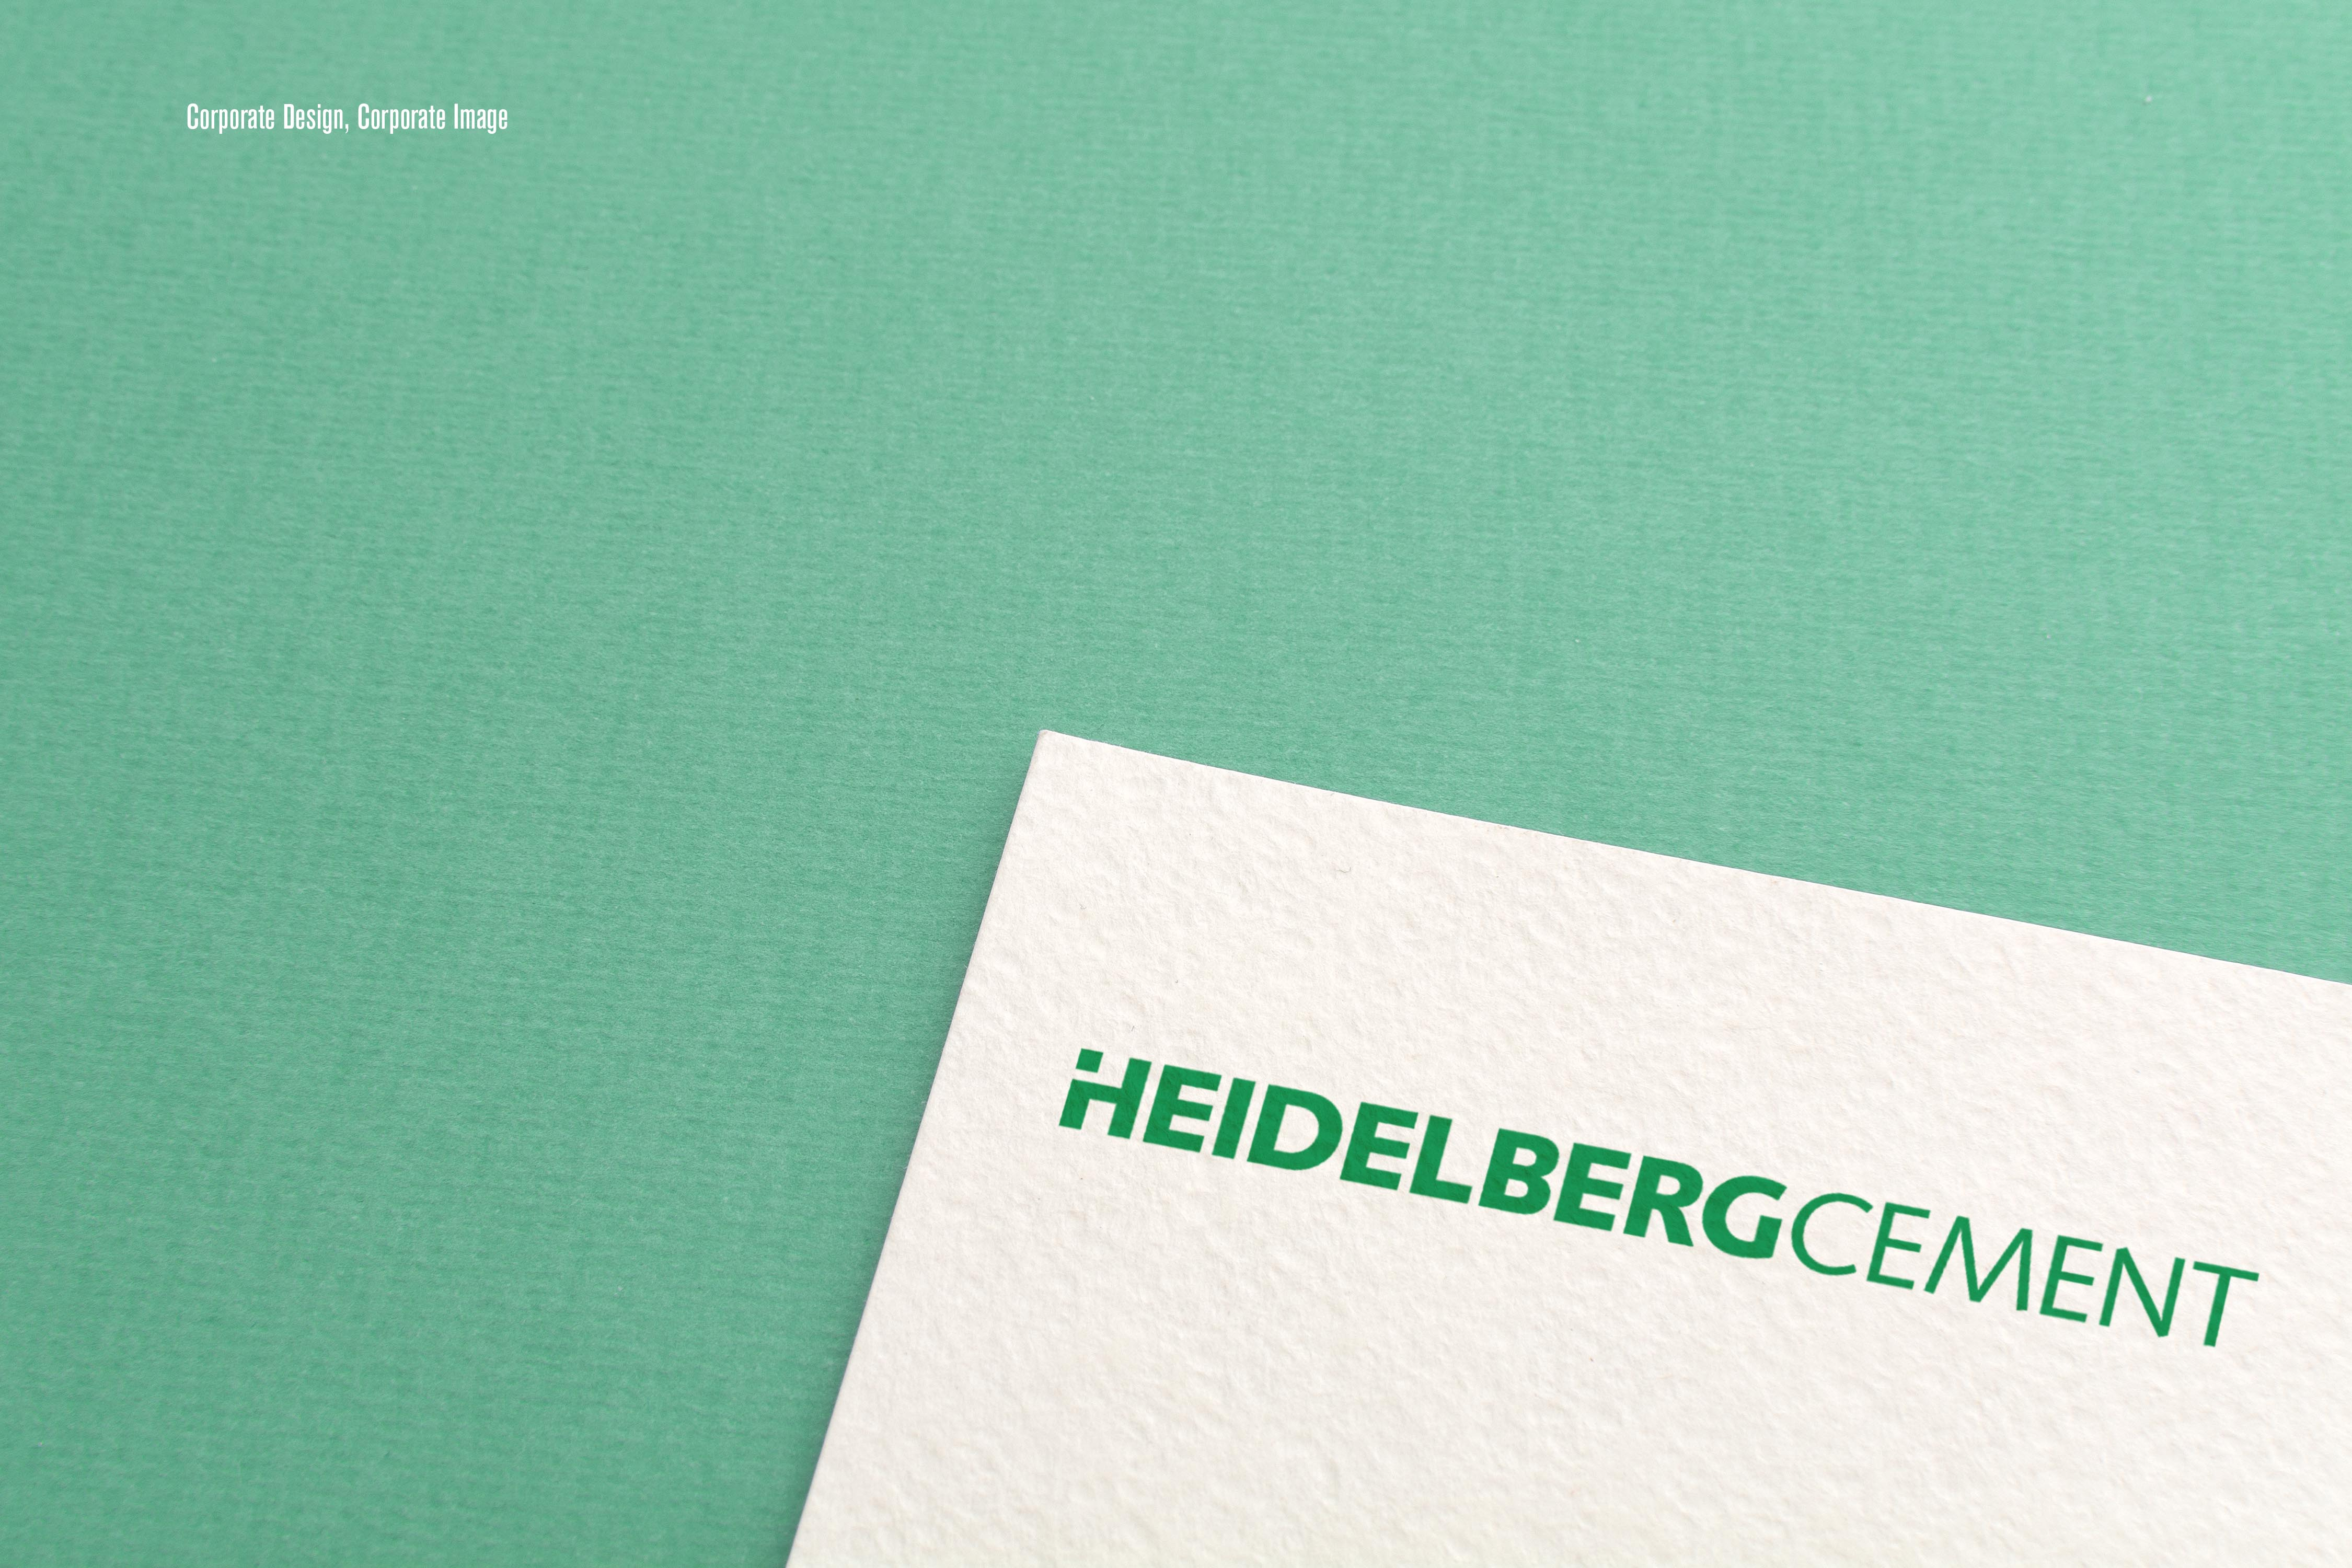 Heidelberg Cement Logo Kopie